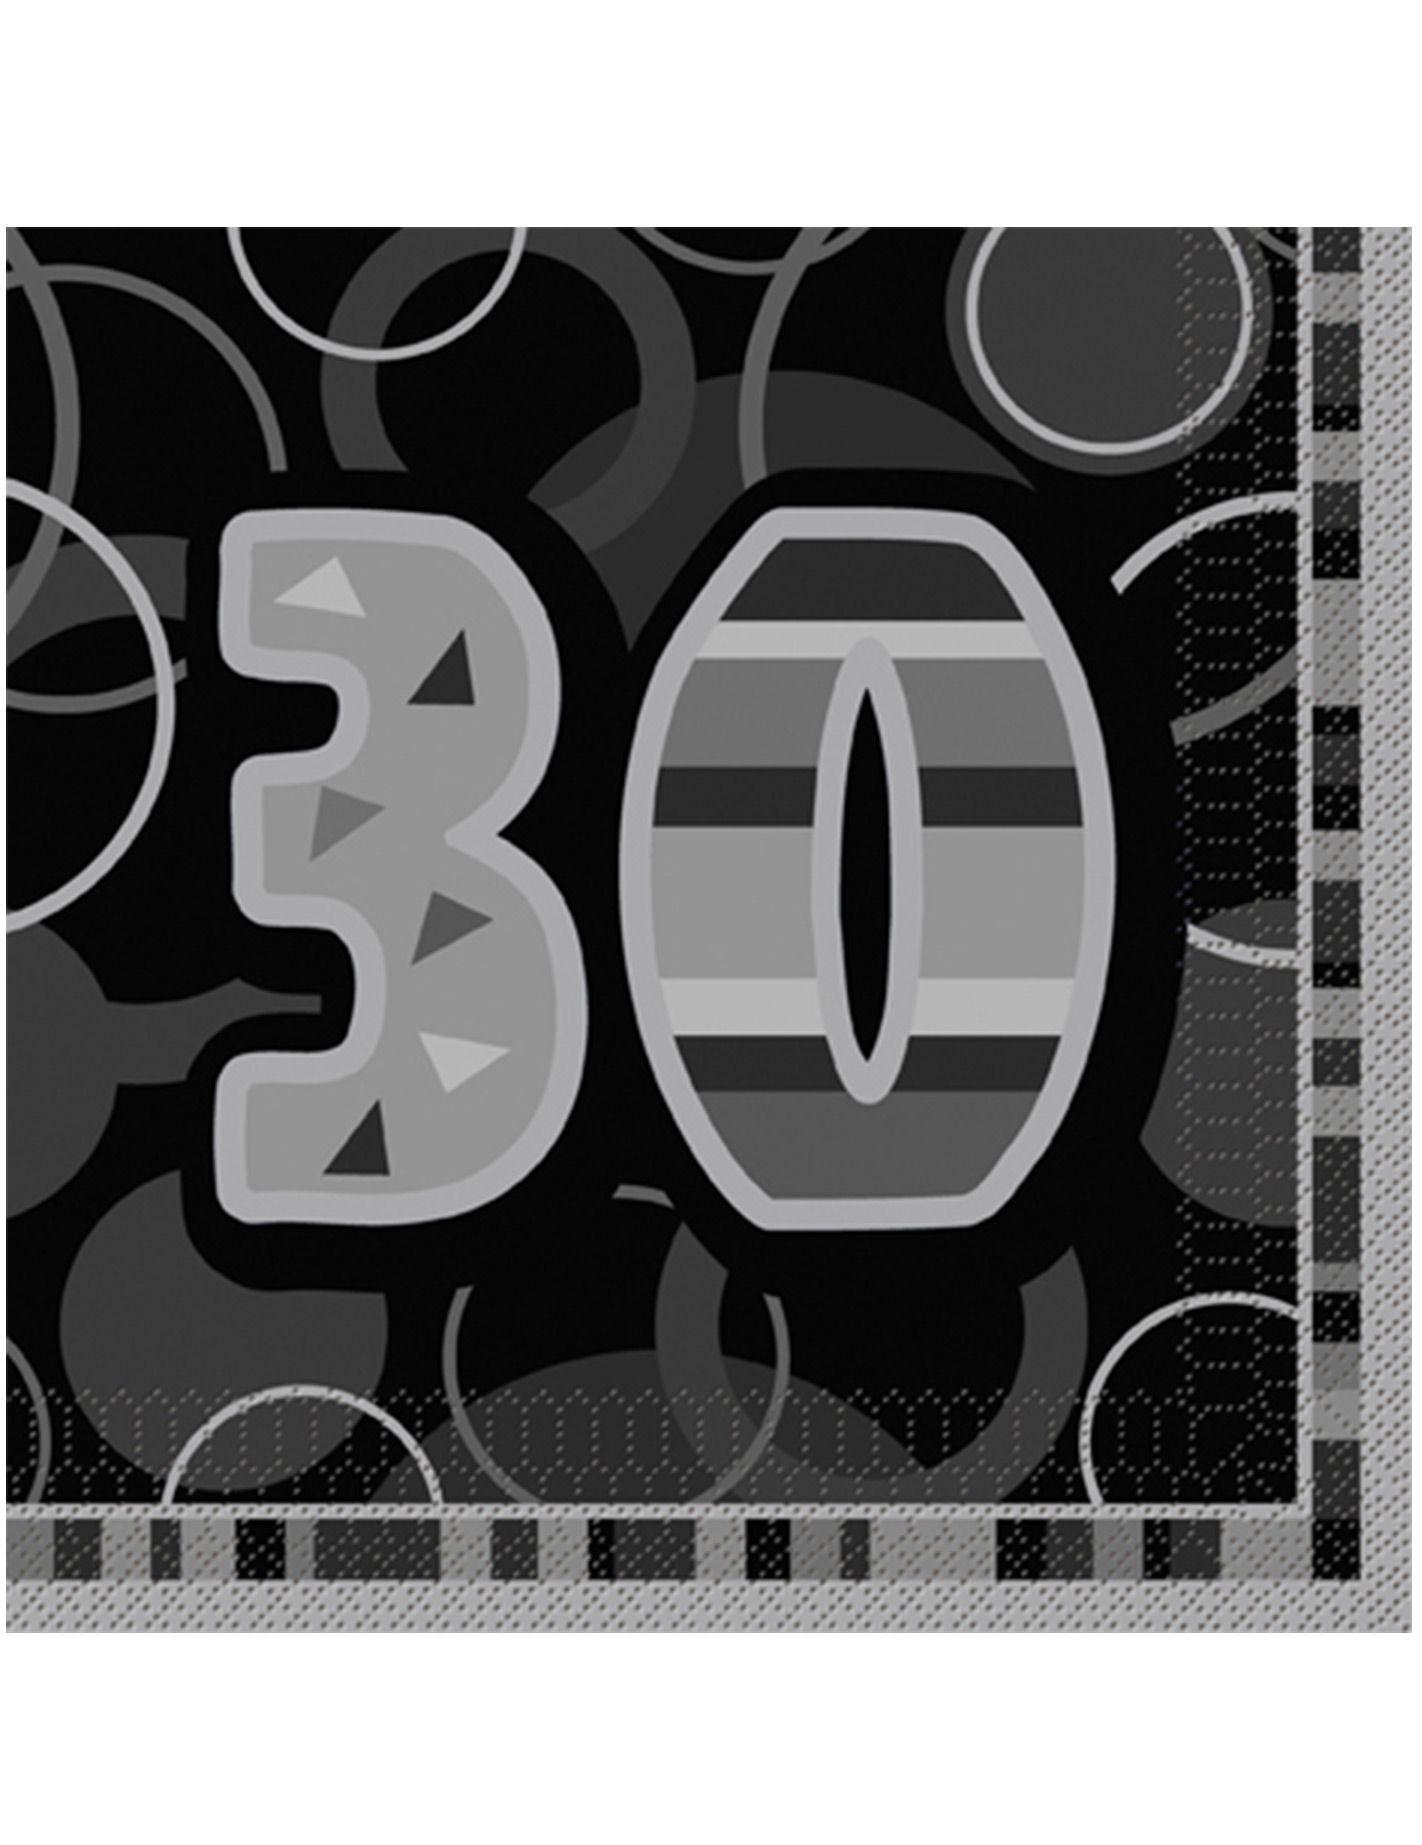 2 x Wave Vinyl Sticker Car Travel Luggage #9730